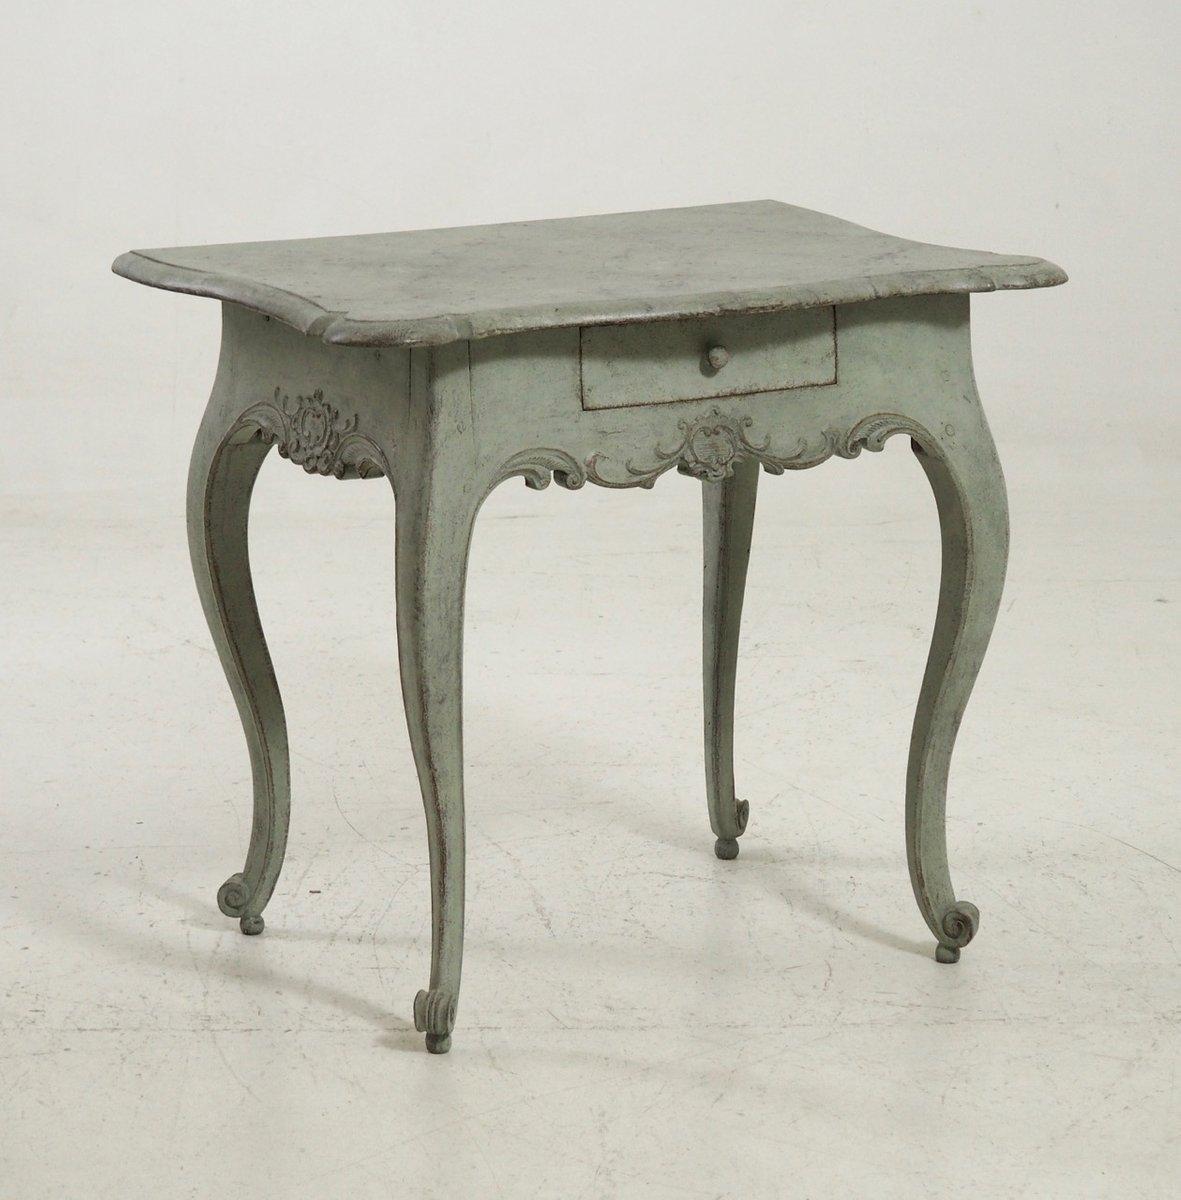 Antique Scandinavian Small Table, 1750s